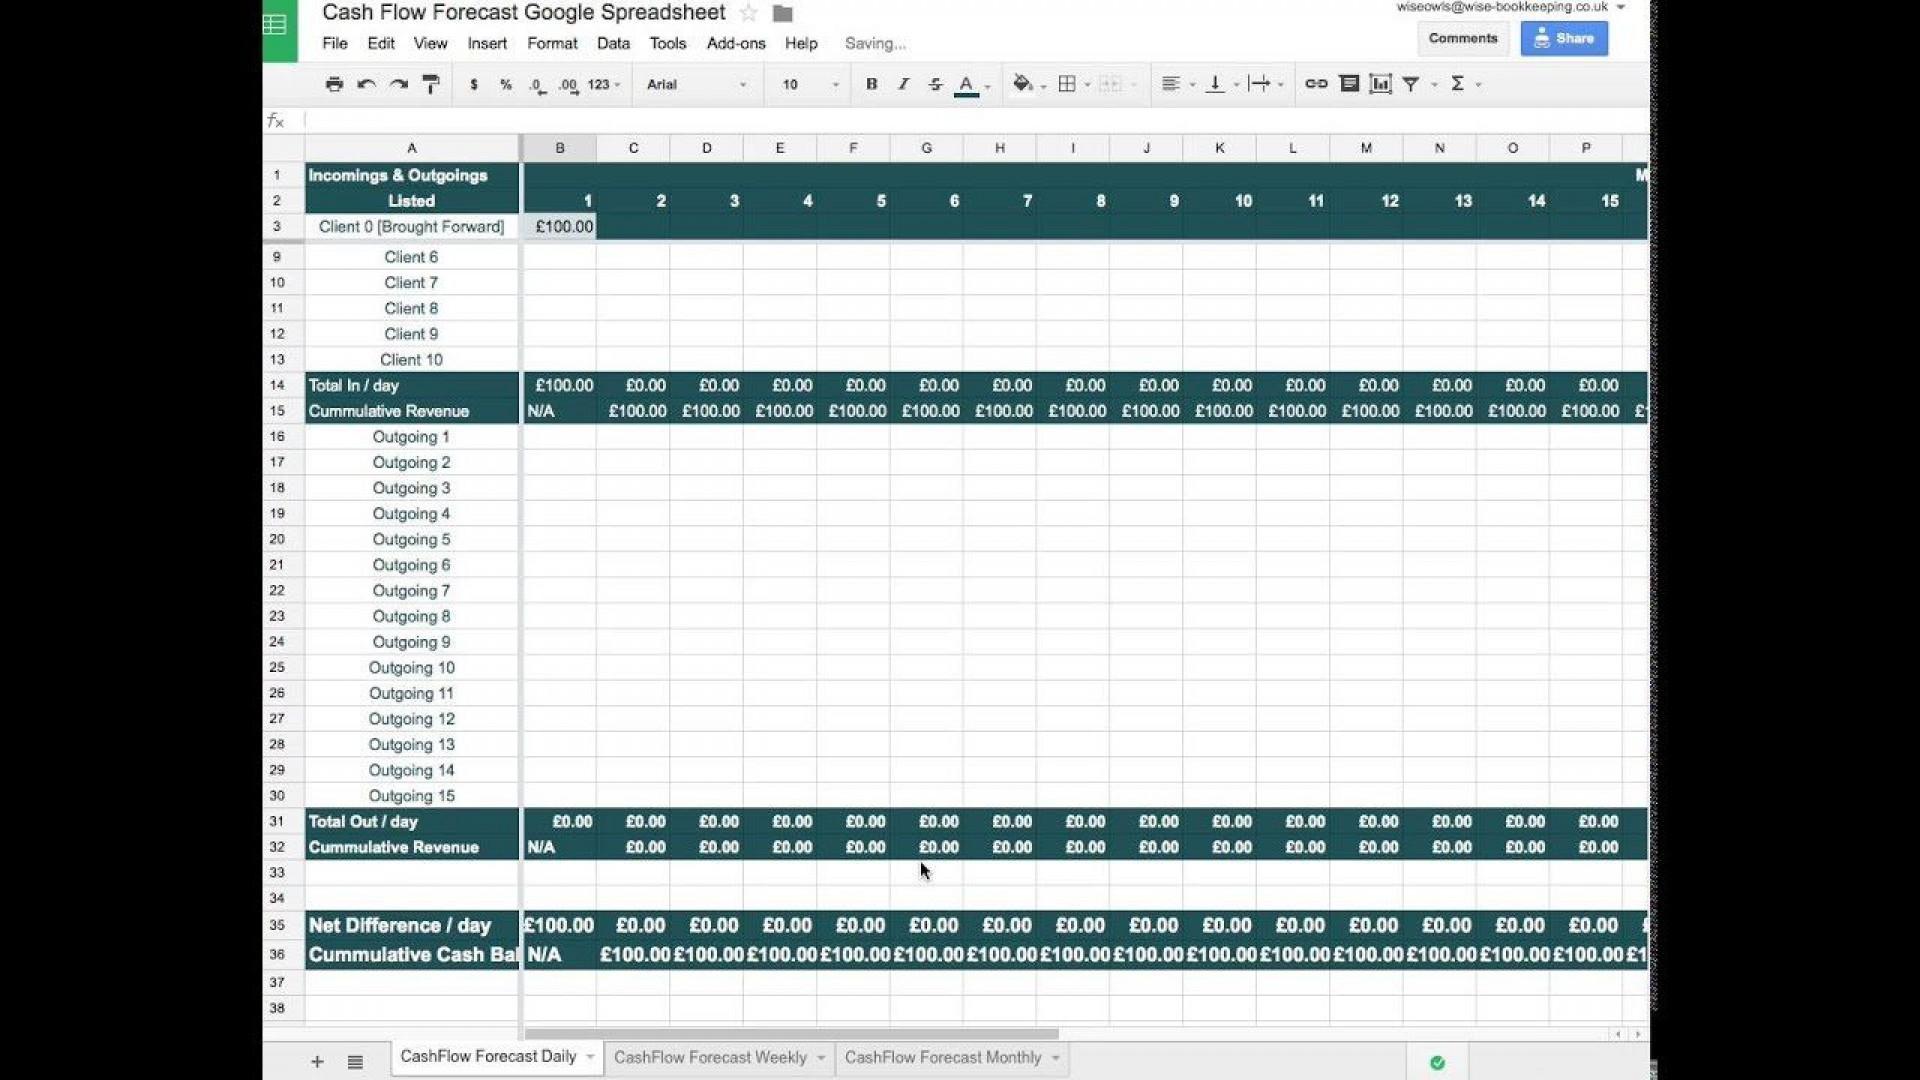 007 Incredible Statement Of Cash Flow Template Google Doc Sample  Docs1920